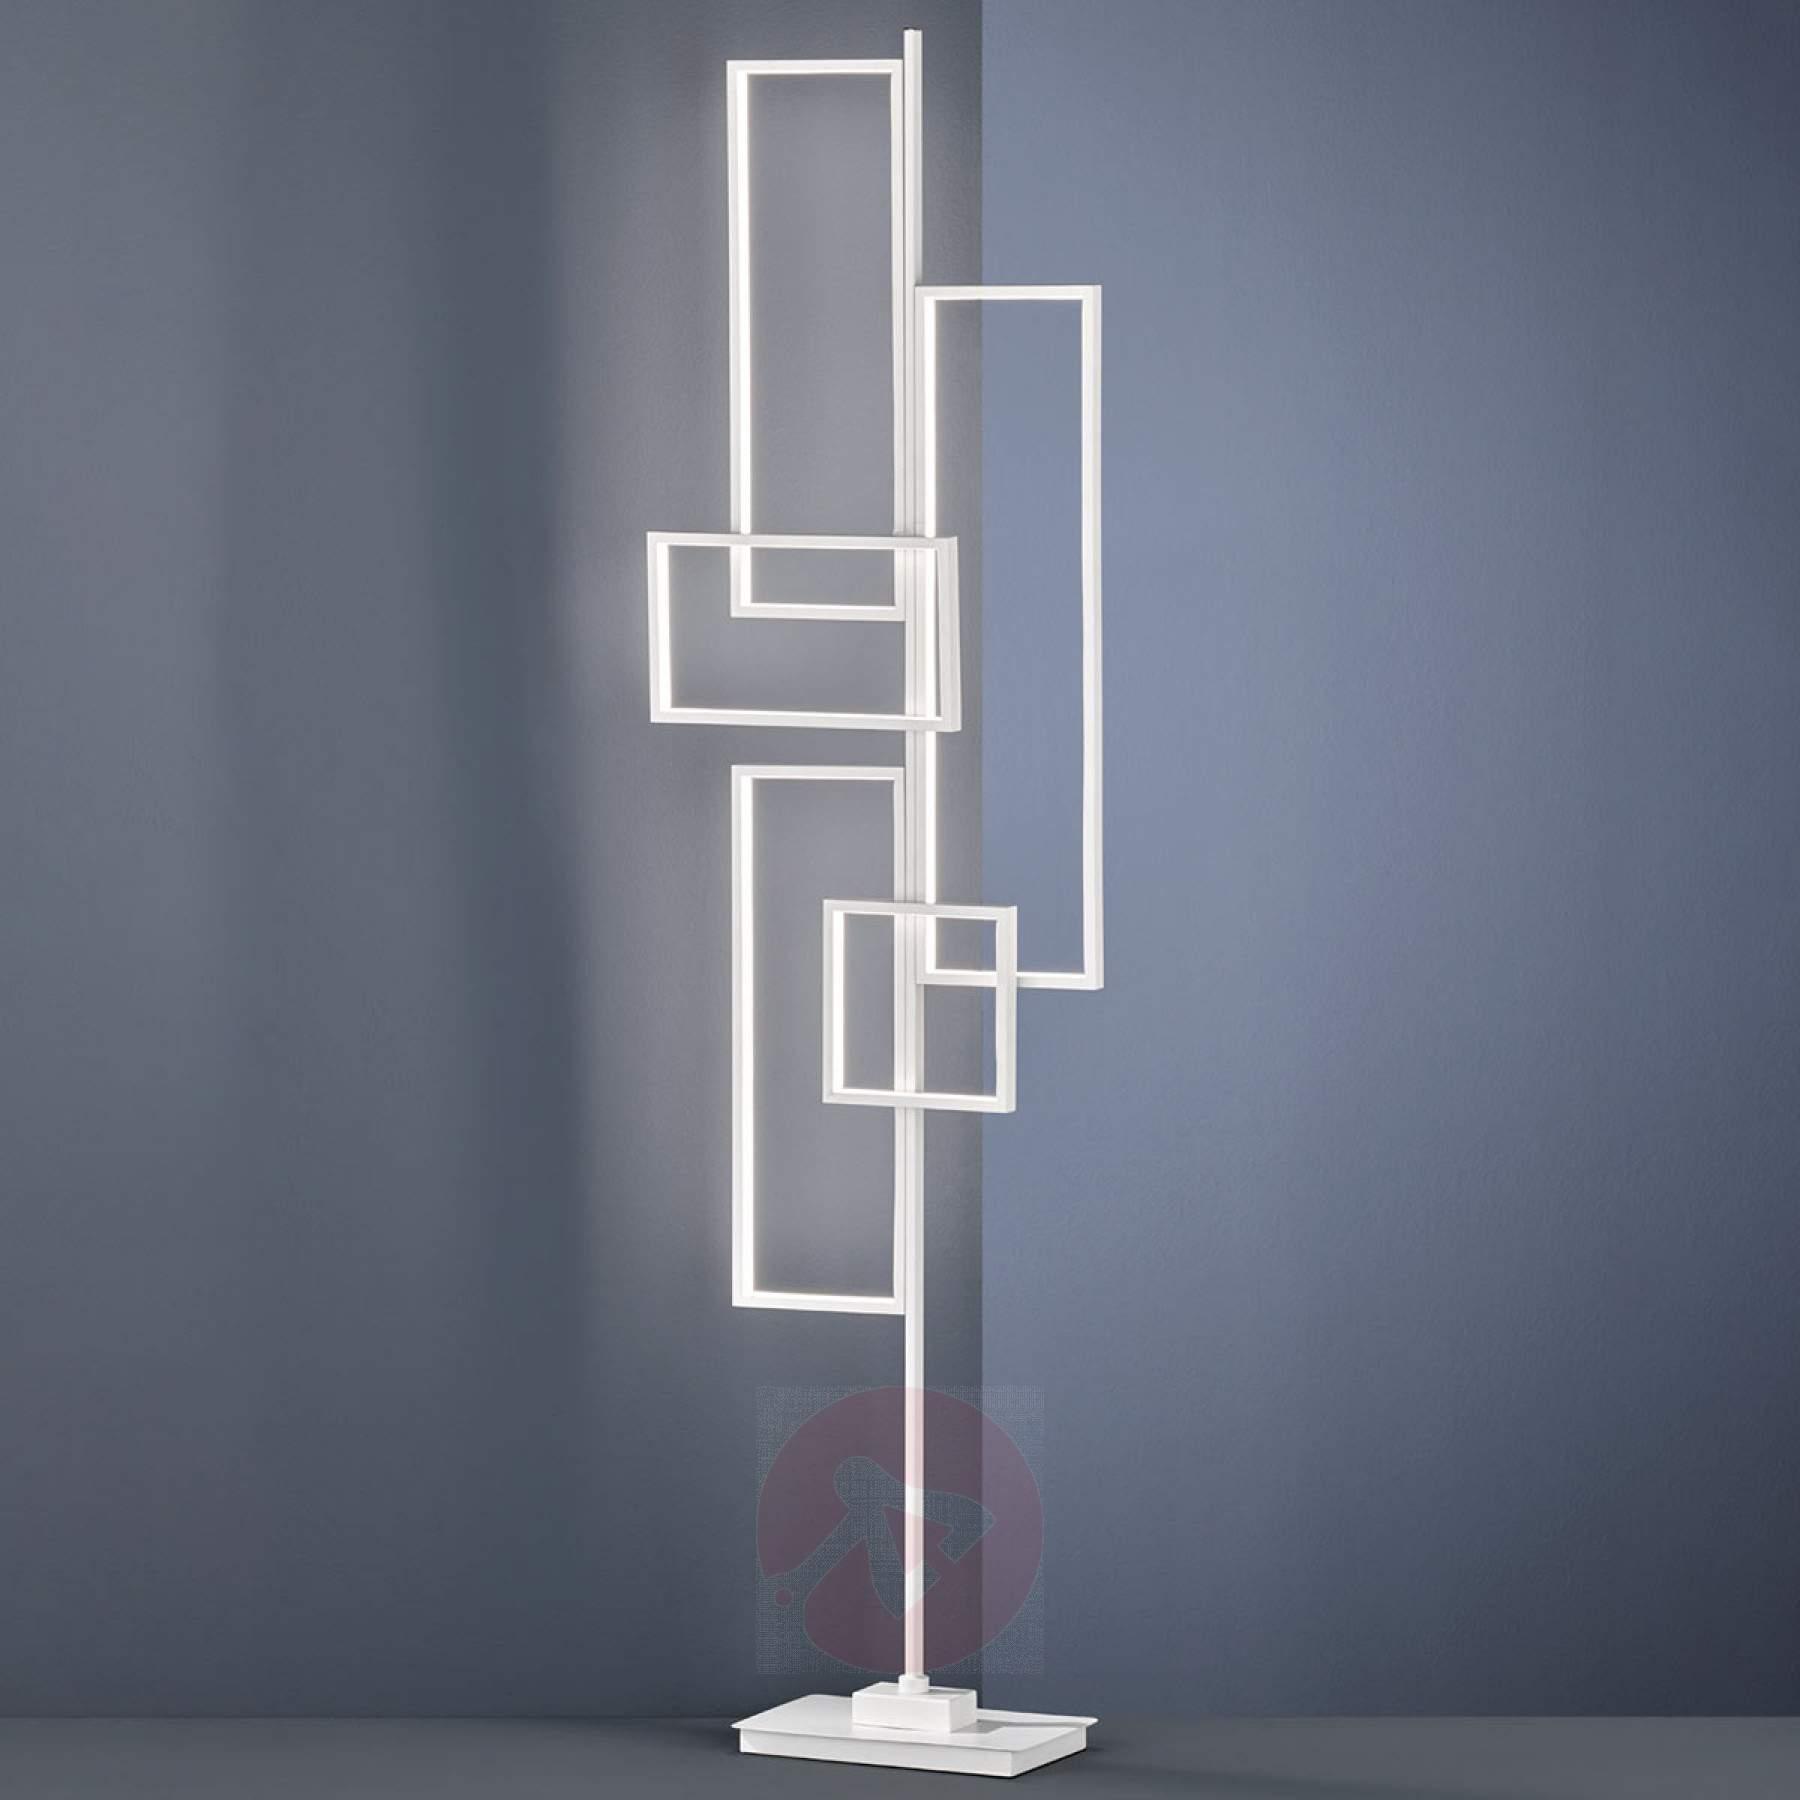 Full Size of Stehlampe Led Dimmbar Deckenfluter Fernbedienung Farbwechsel Mit Leselampe Amazon Leseleuchte Test Dimmbare Tucson Fuschalter Kaufen Lampenweltde Big Sofa Wohnzimmer Stehlampe Led Dimmbar